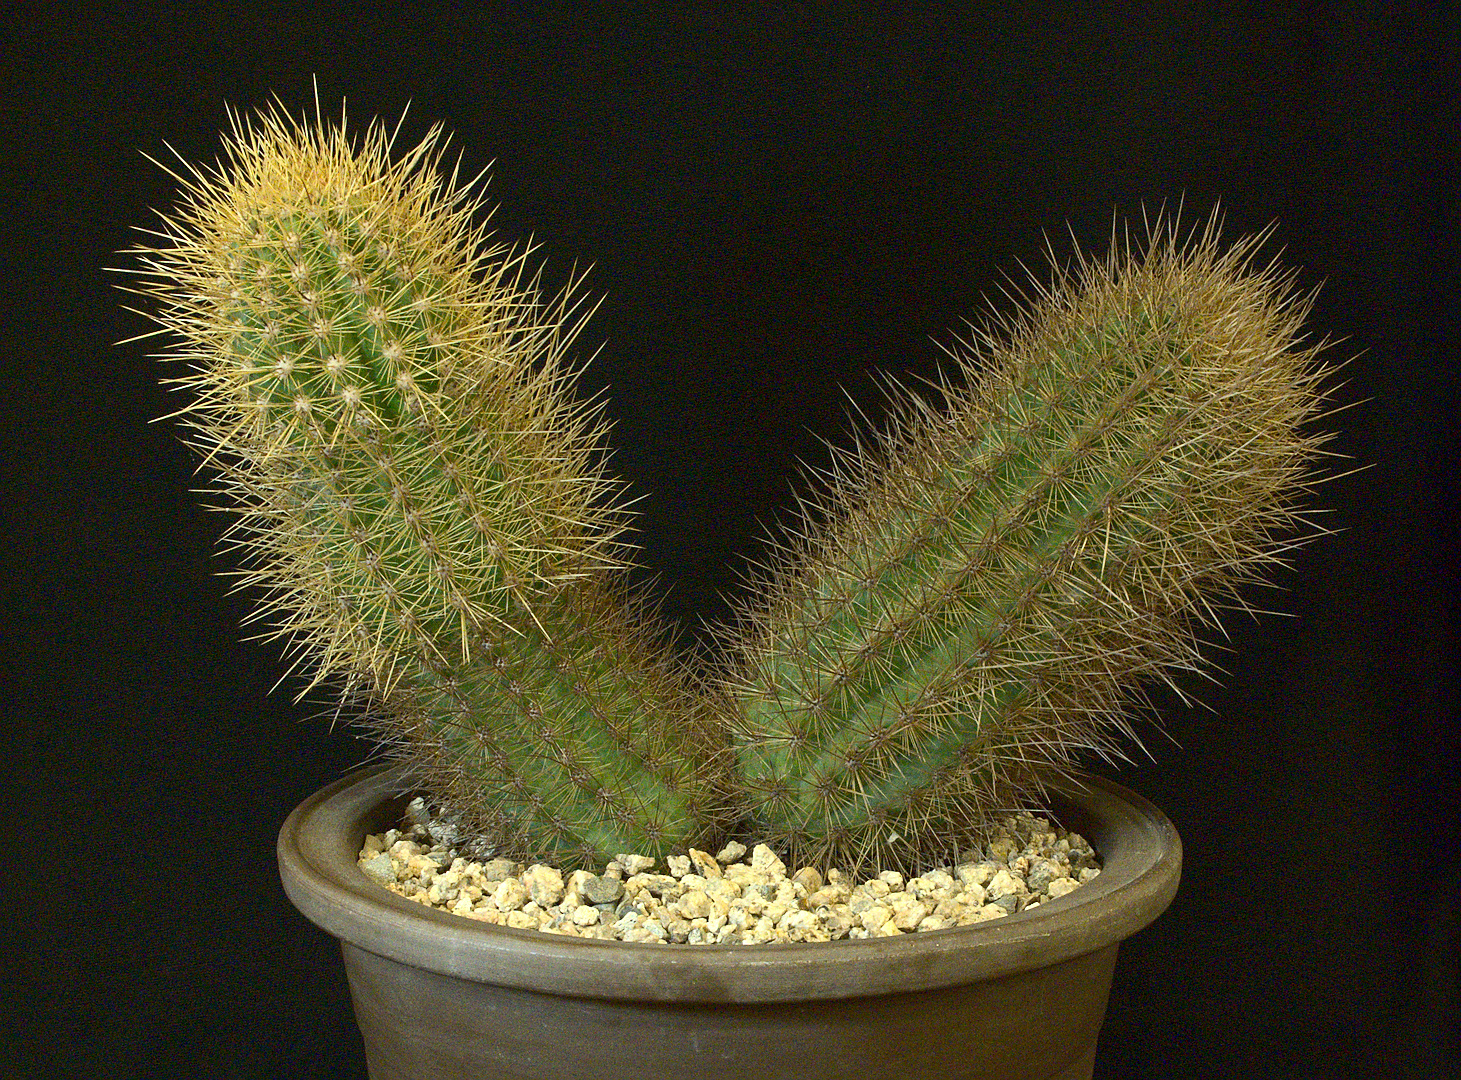 SCCSS 2018 November - Winner Open Cactus - Maria Capaldo - Pachycereus orcutii